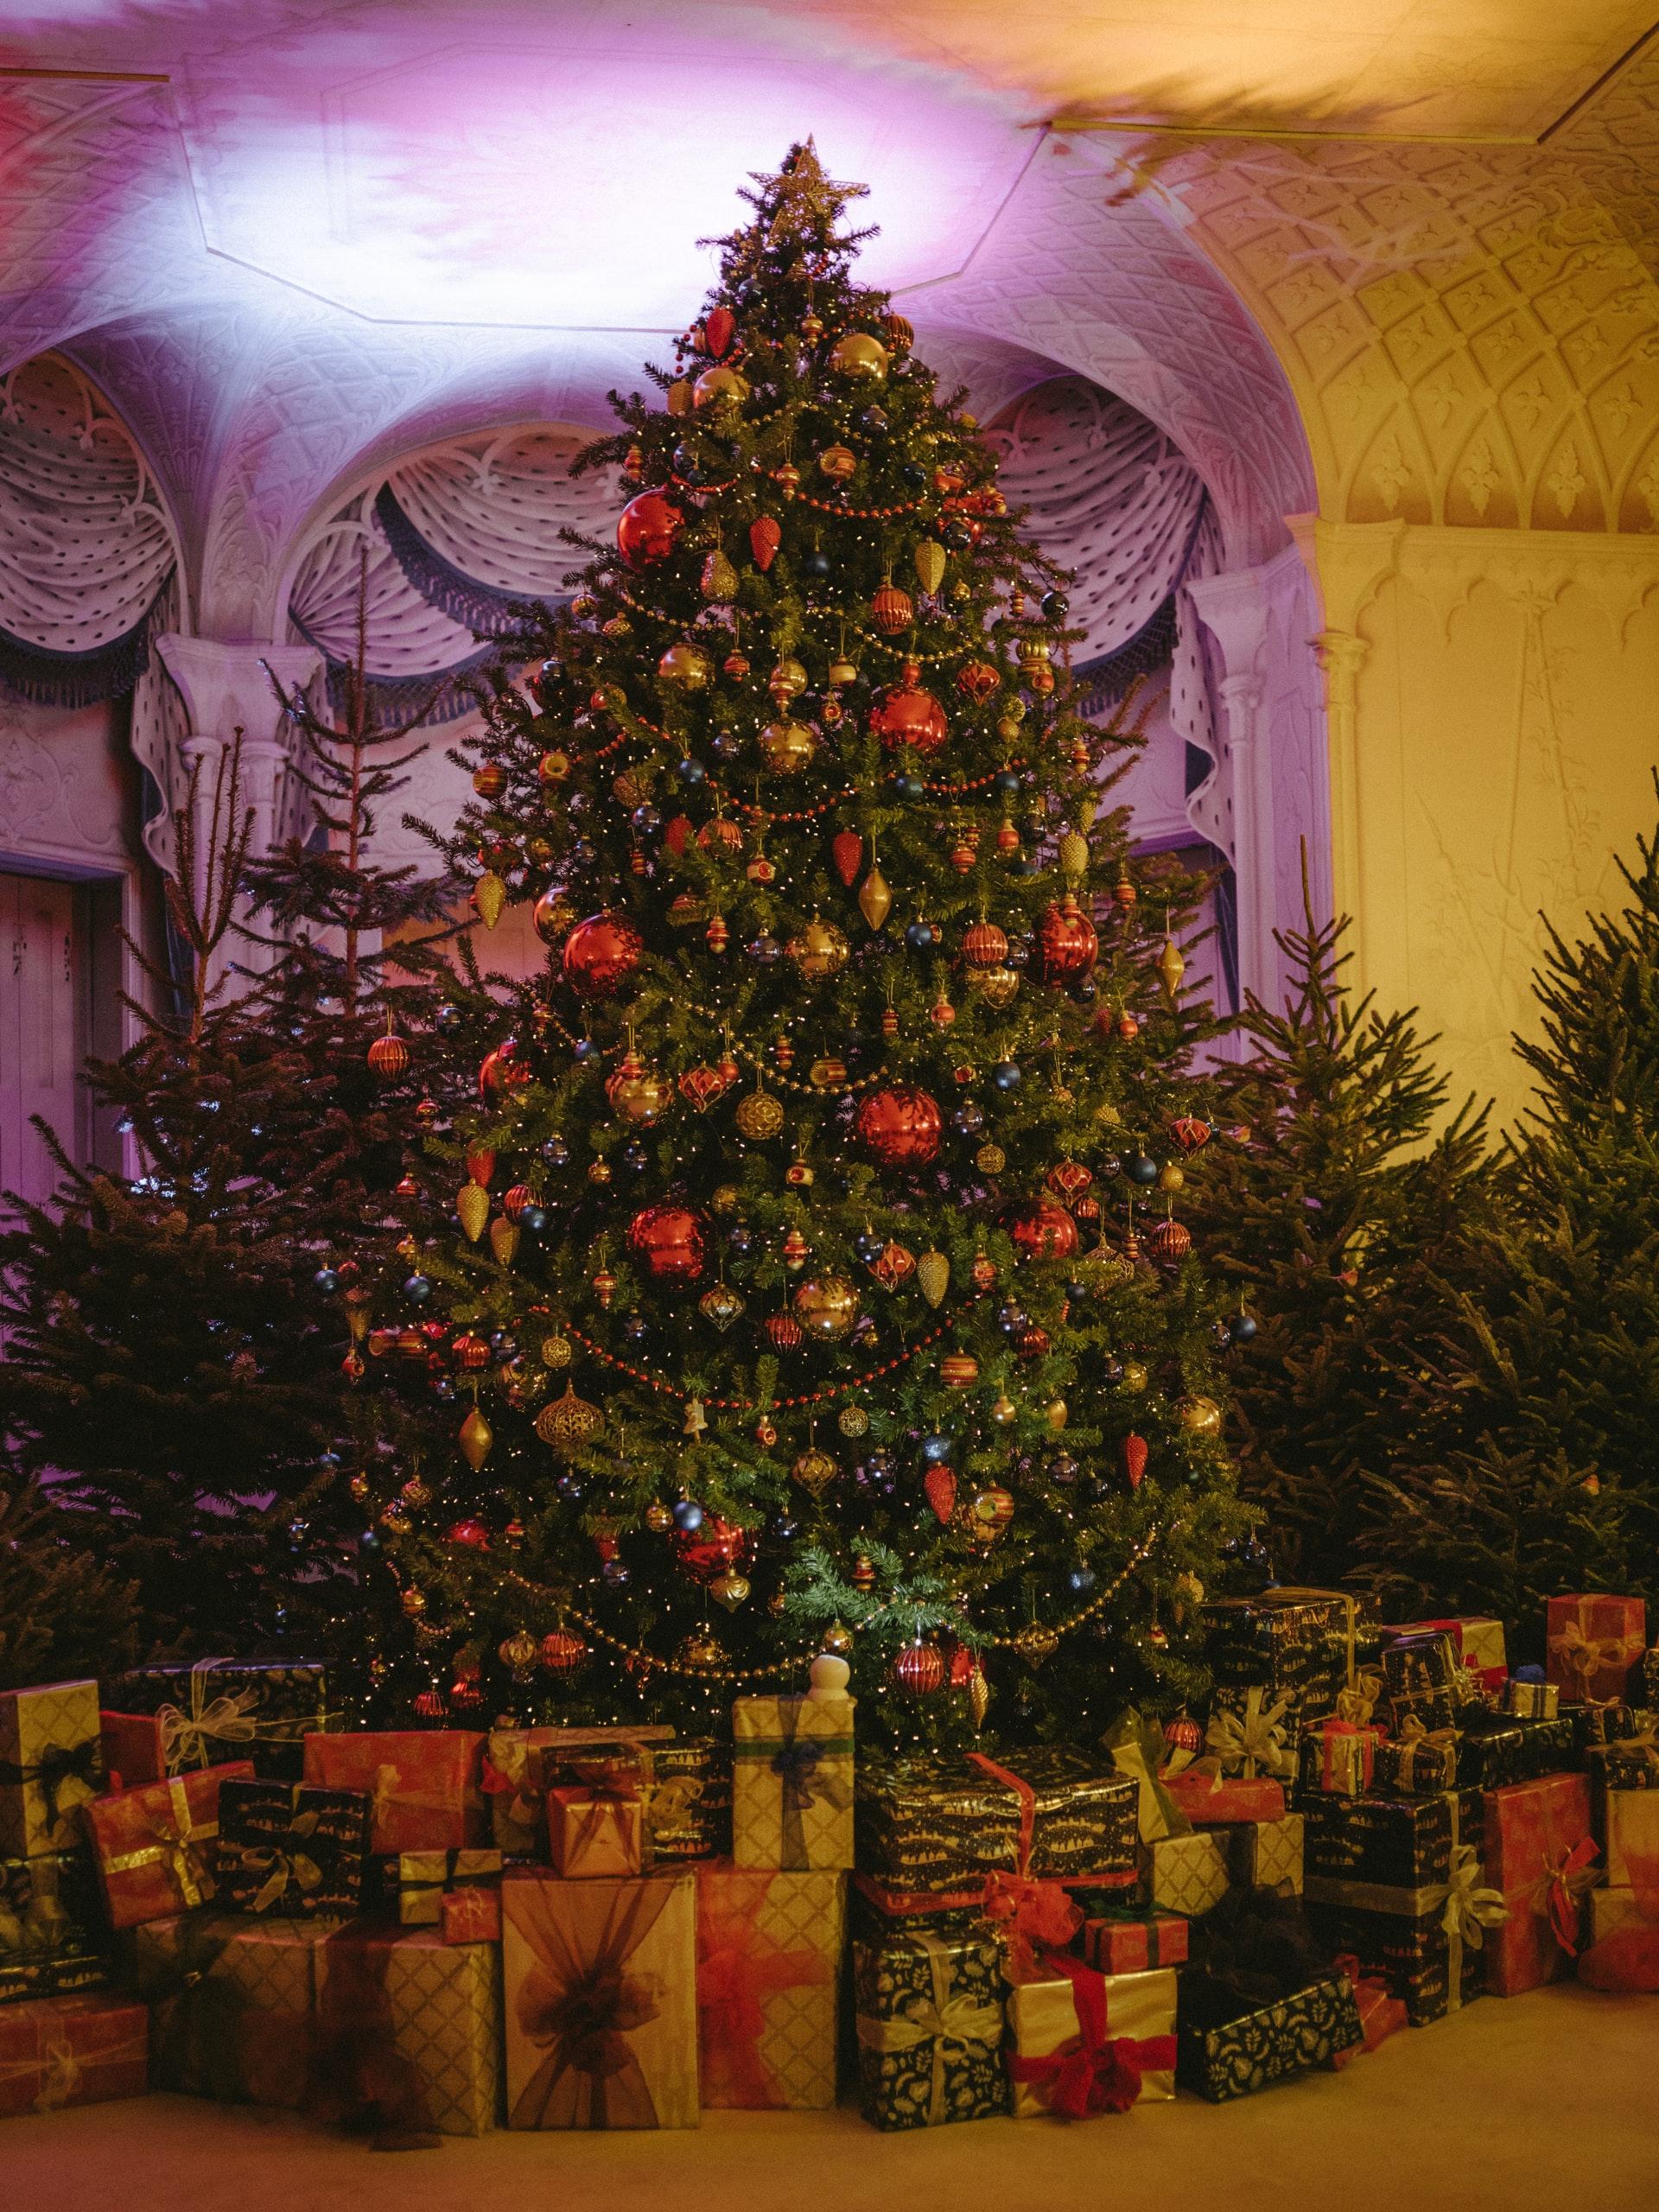 Arden Ornaments Design Ideas Poplar Wood Ornaments and Trees